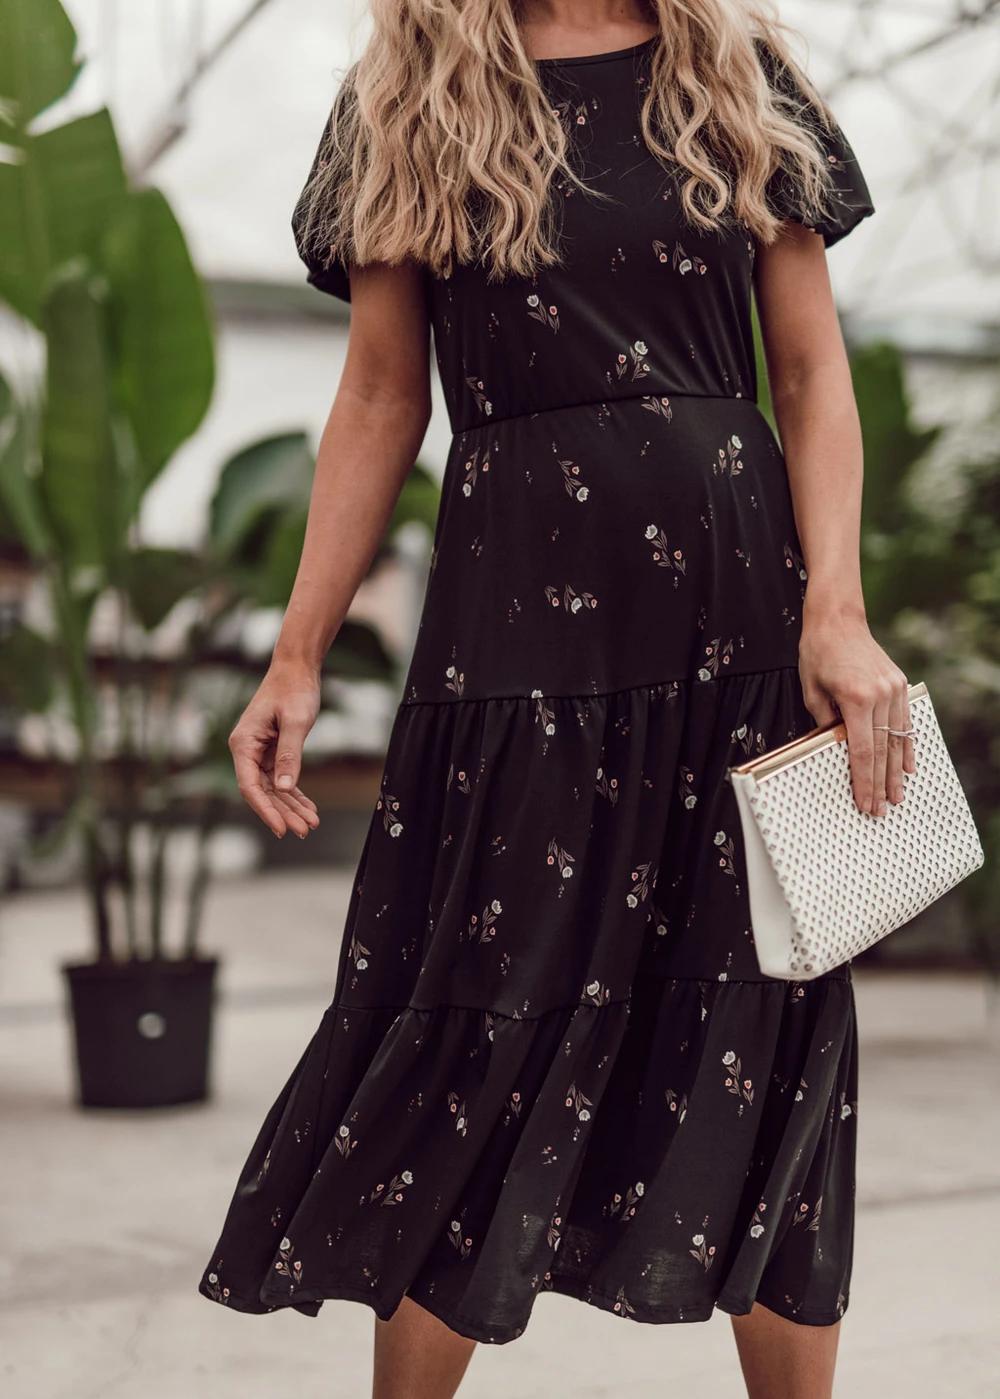 Twyla Floral Midi Dress Jessakae Modest Dress Wavy Hair Blogger Ootd Style Tan Skin Womens Fashion Makeup B Fashion Dresses Trending Fashion Outfits [ 1399 x 1000 Pixel ]